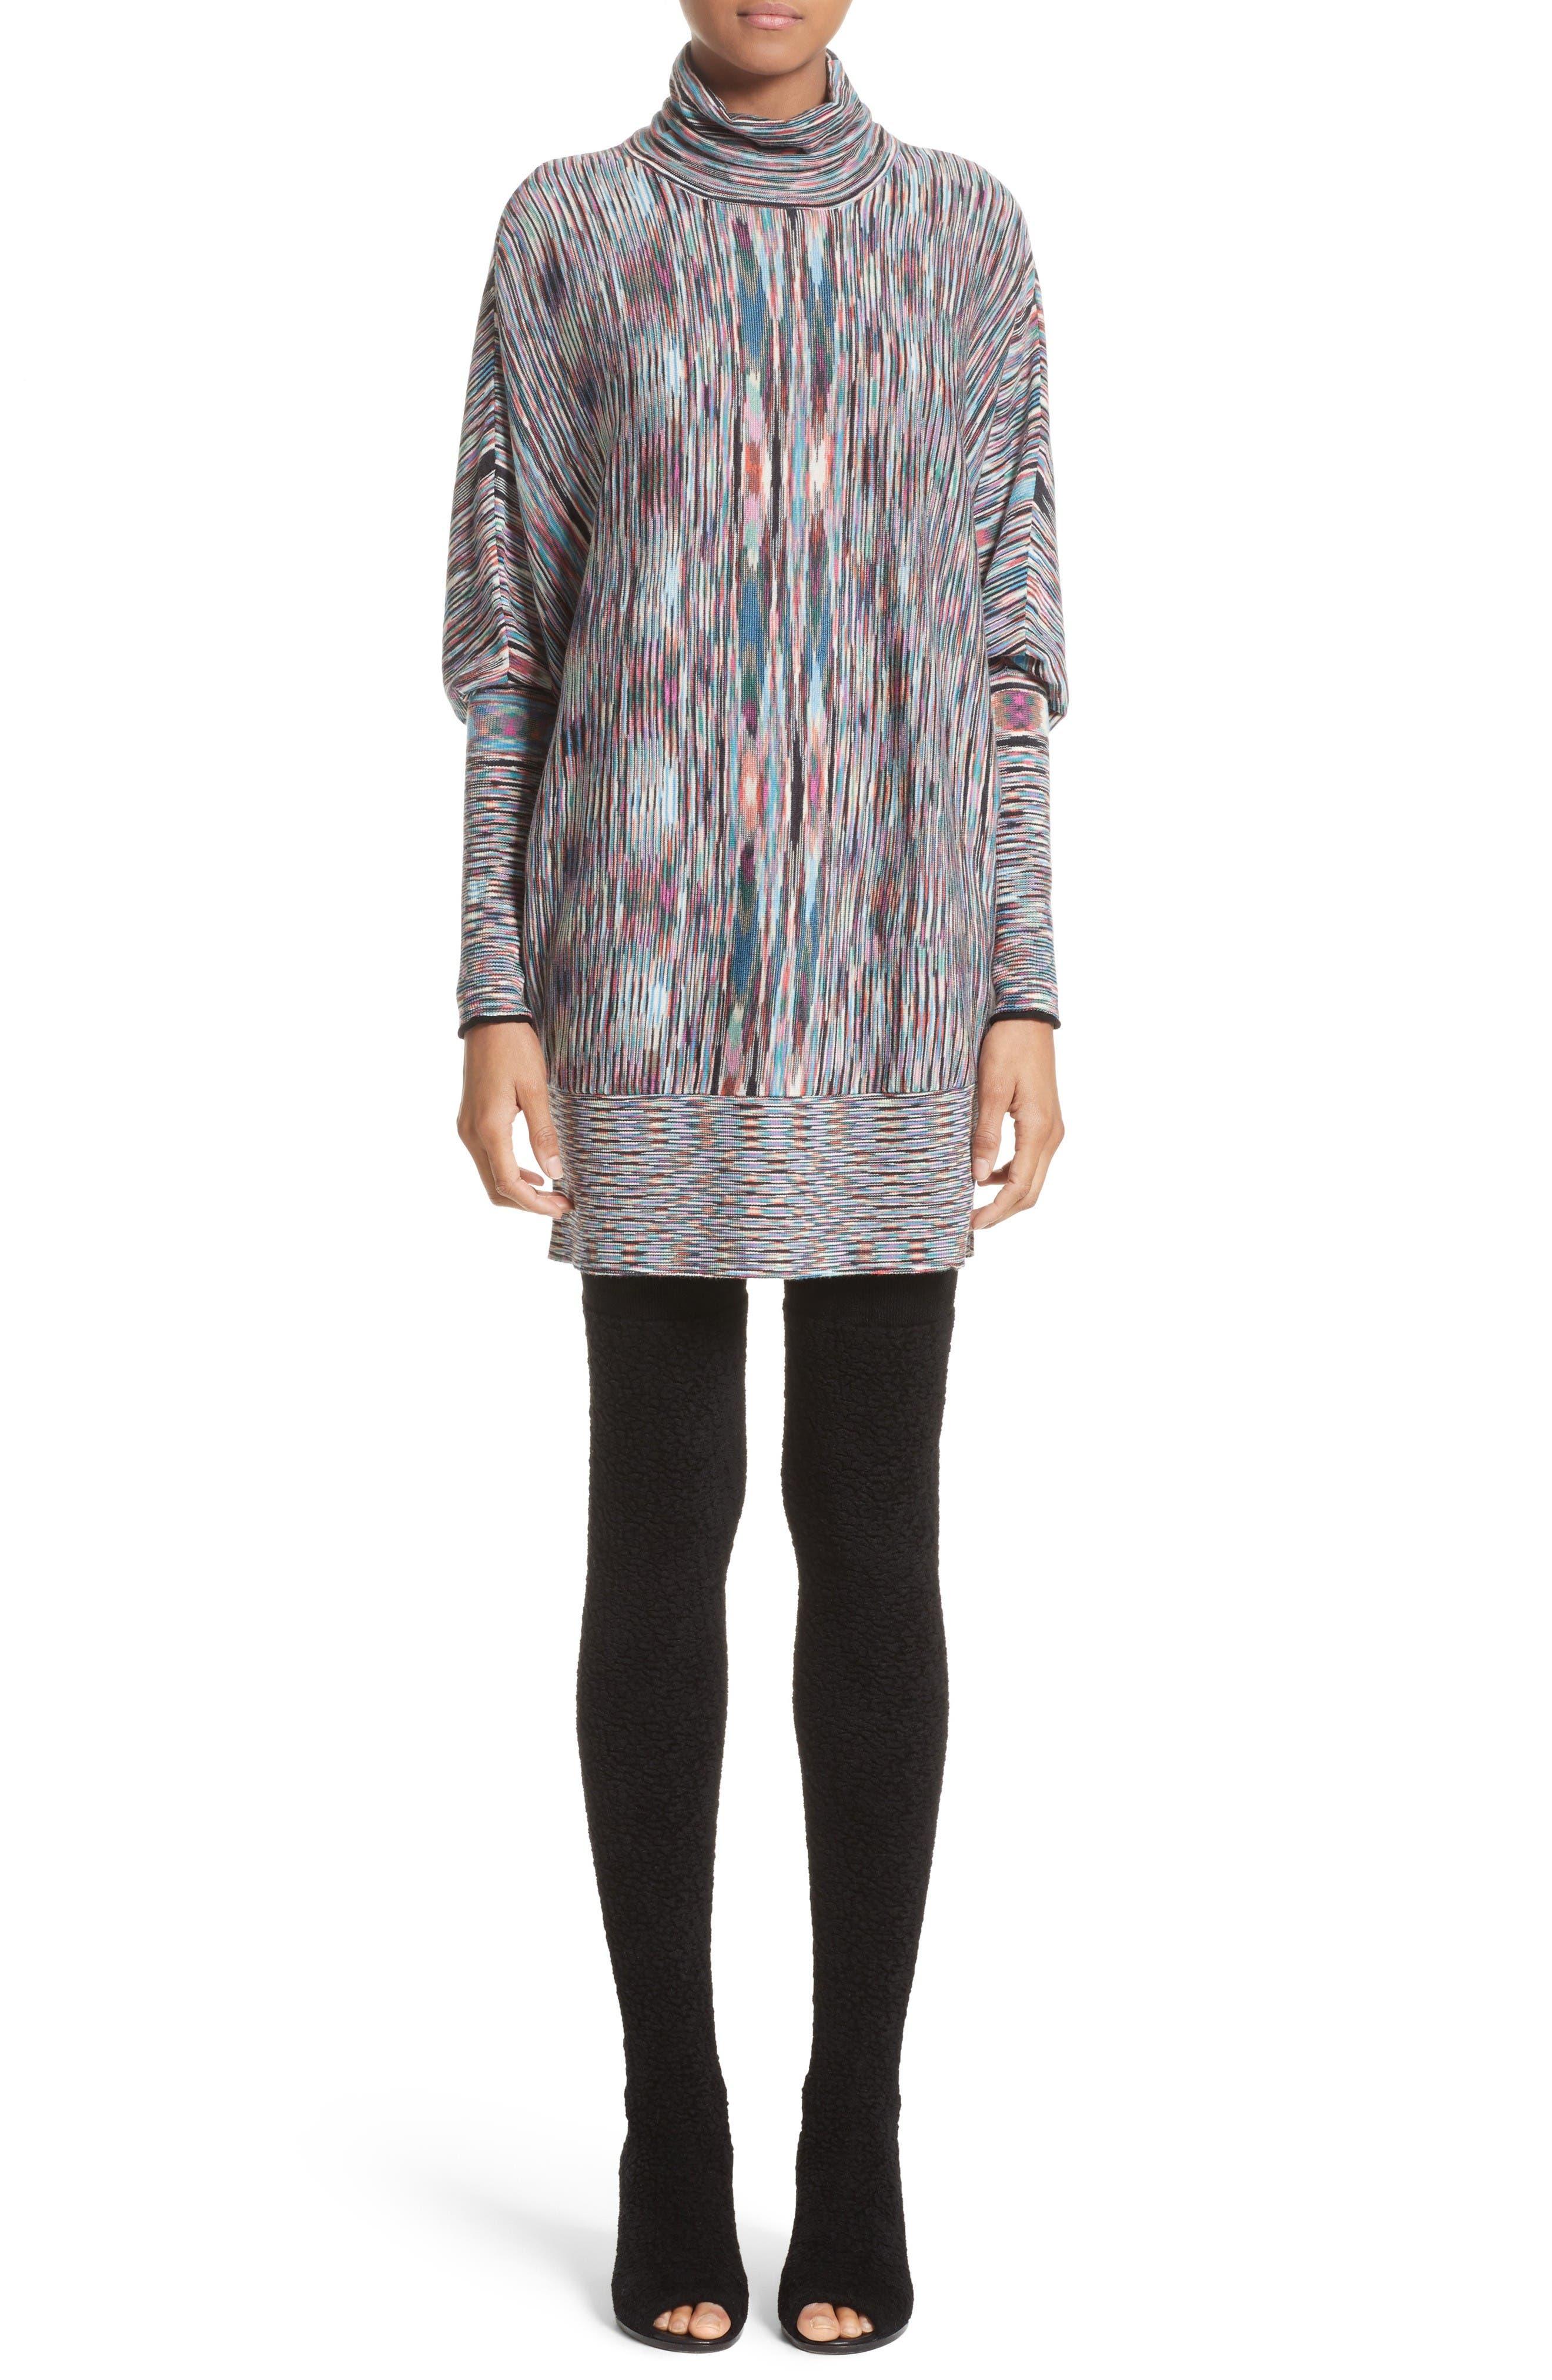 Space Dye Knit Dress,                         Main,                         color, Multi